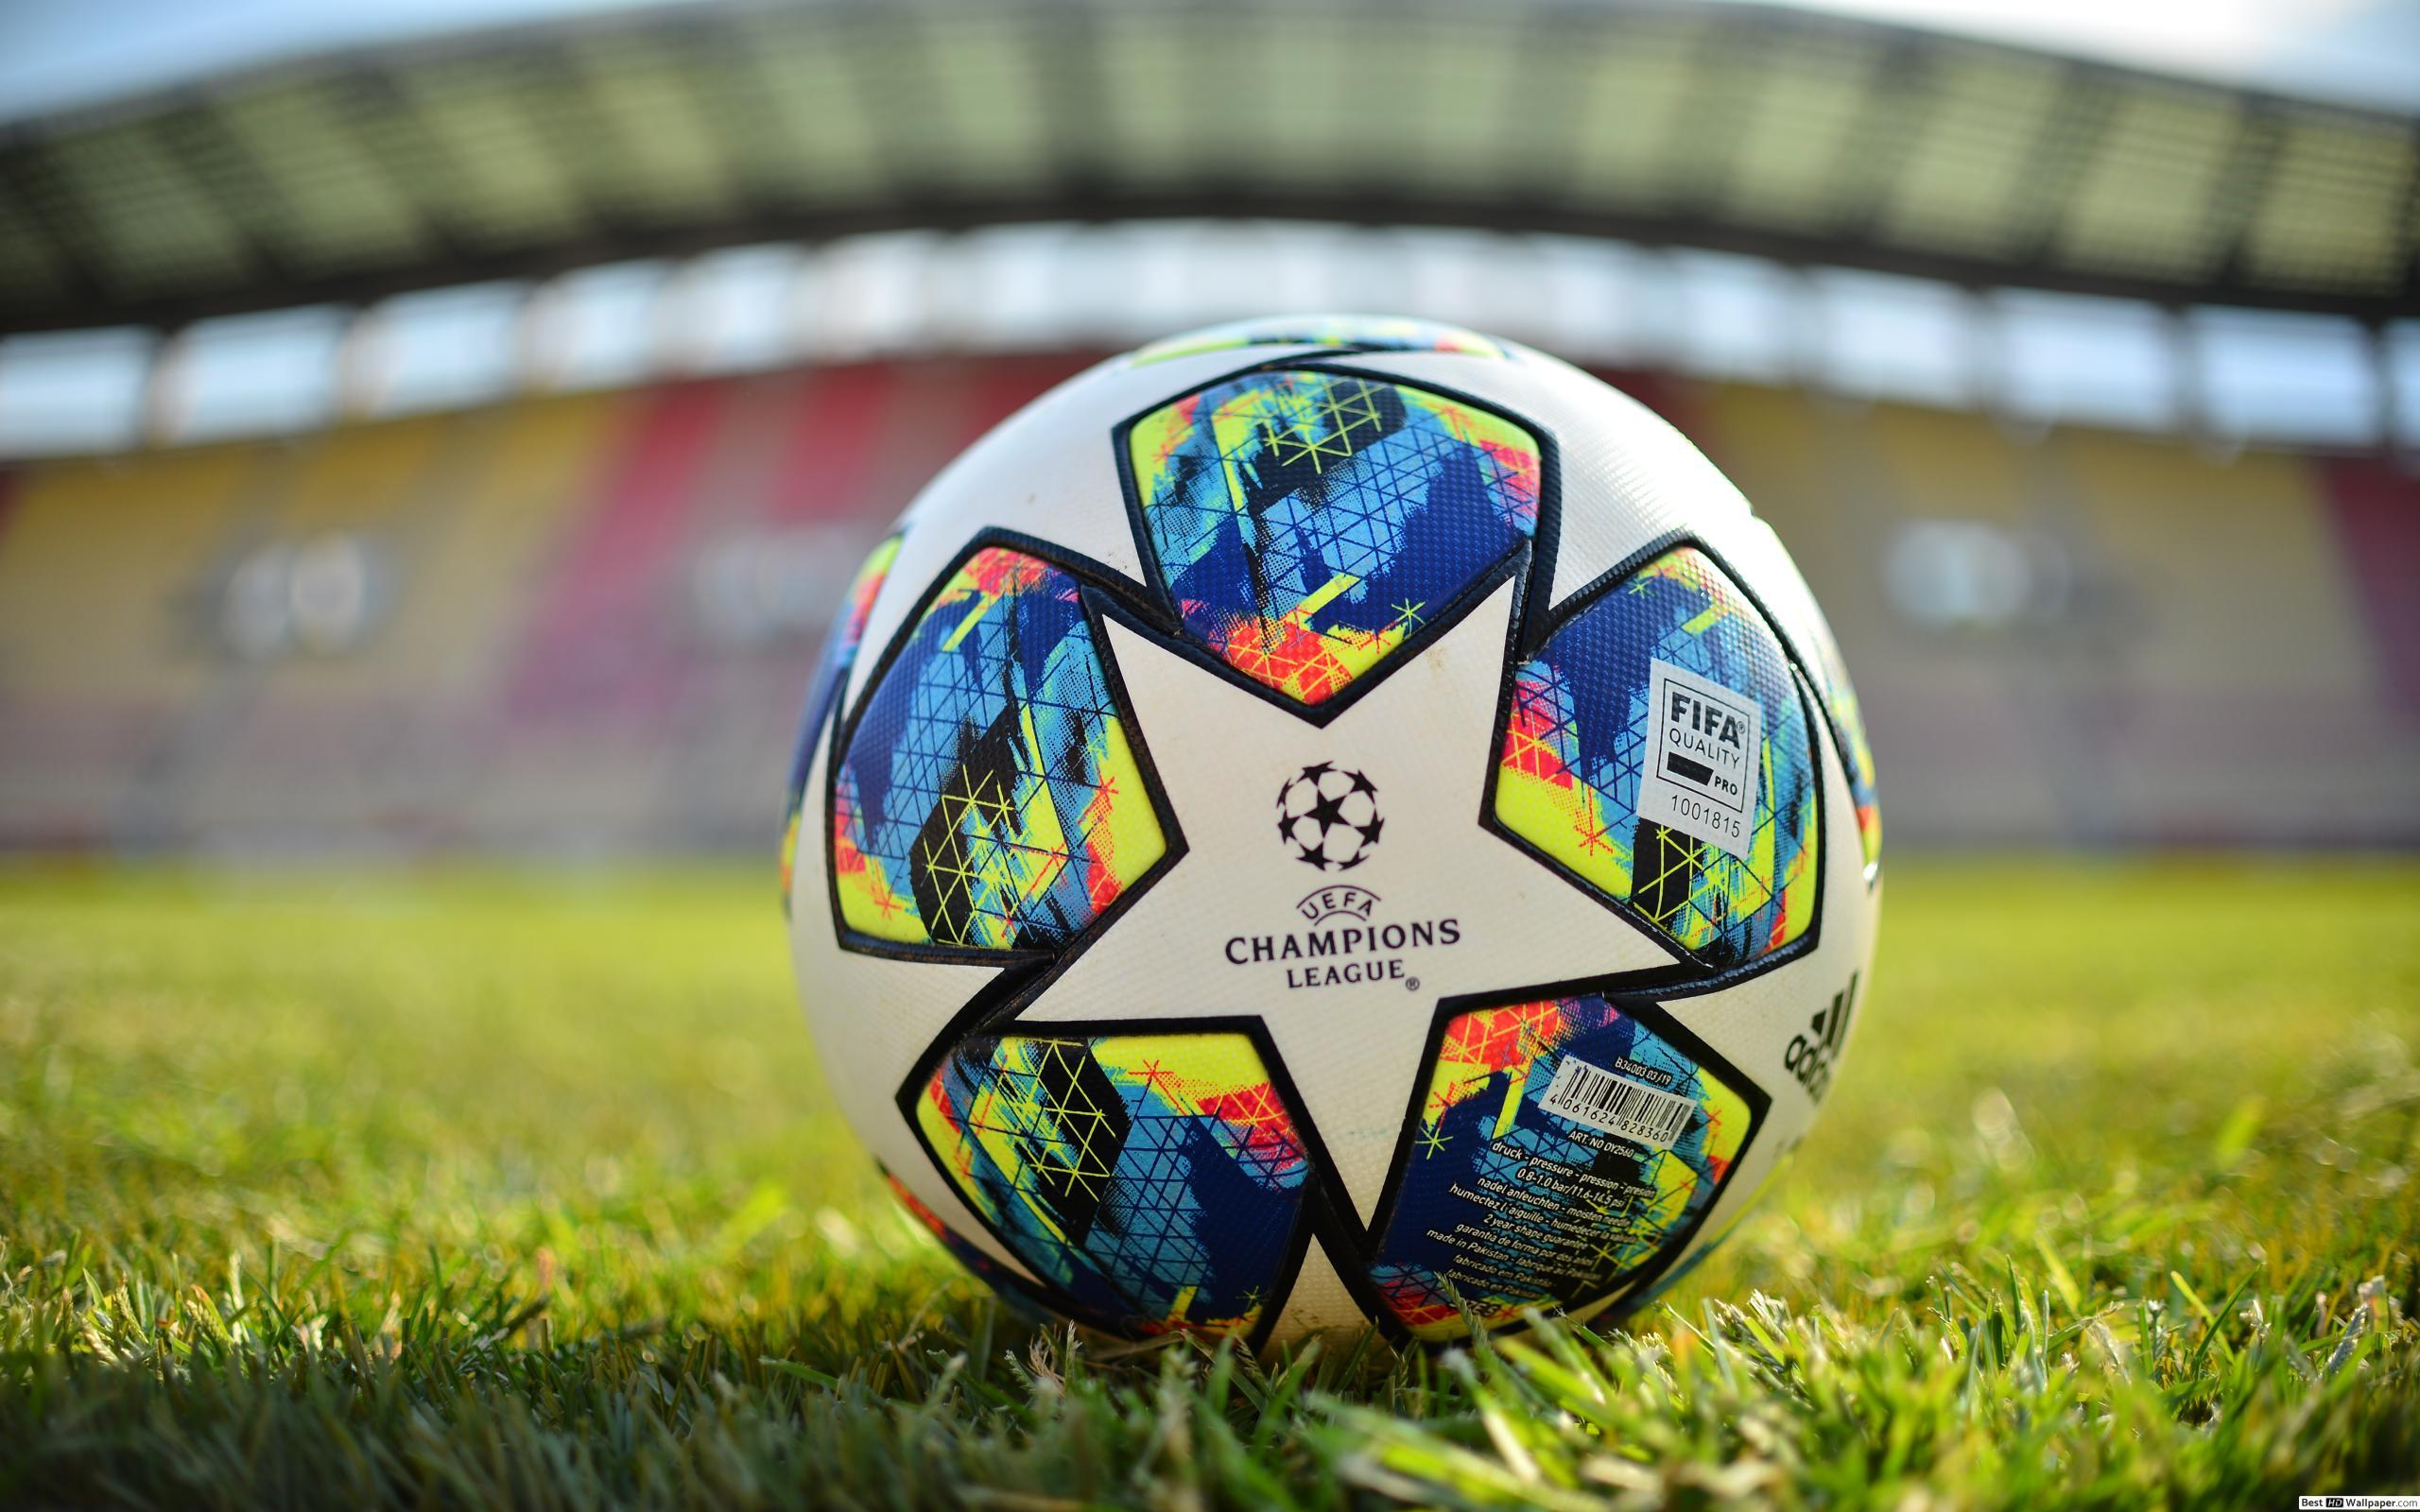 Uefa Champions League 2020 Wallpaper 2560x1600